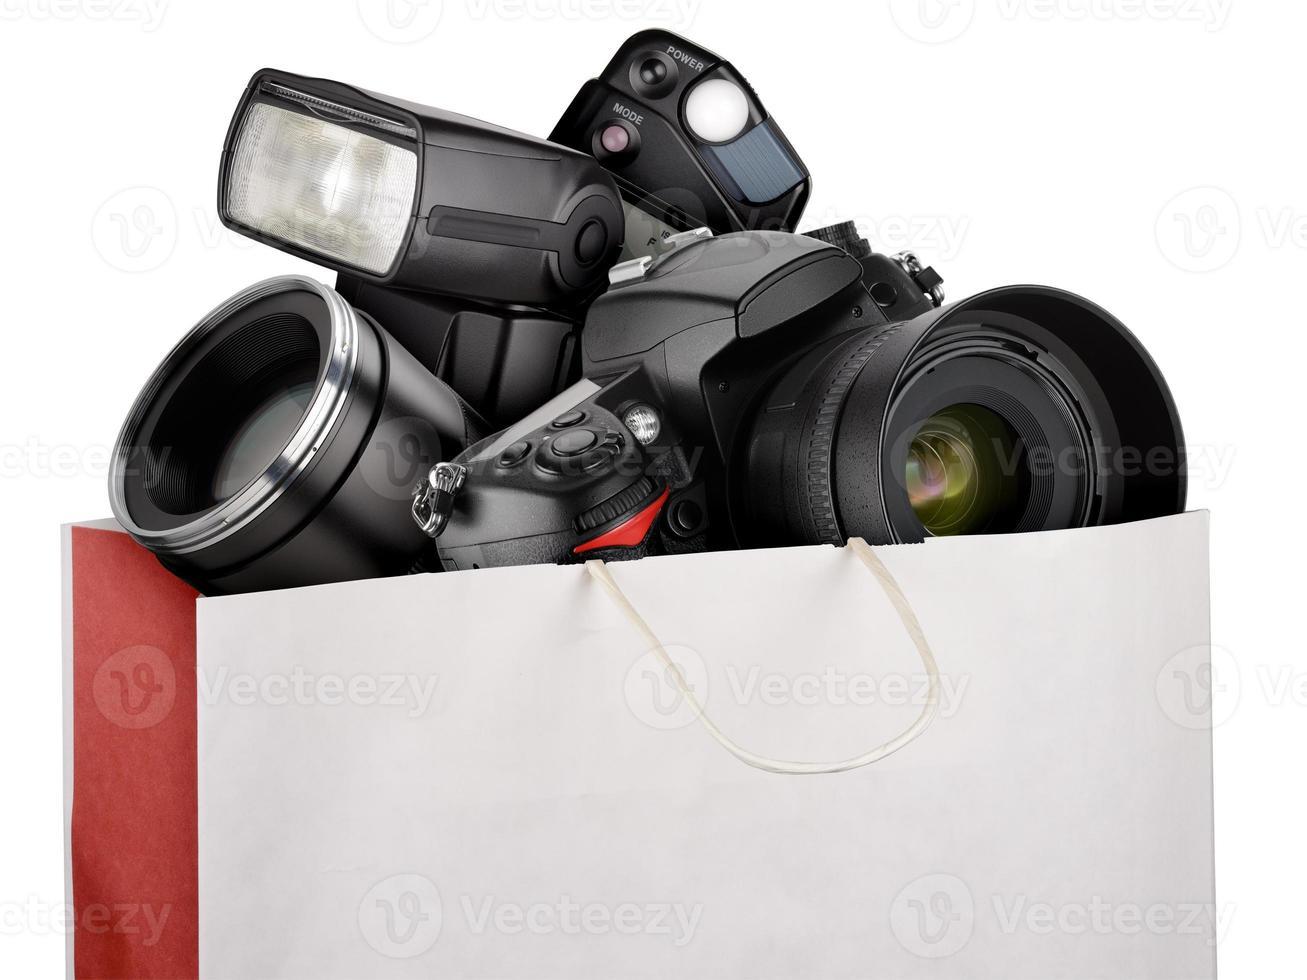 fotografie apparatuur foto